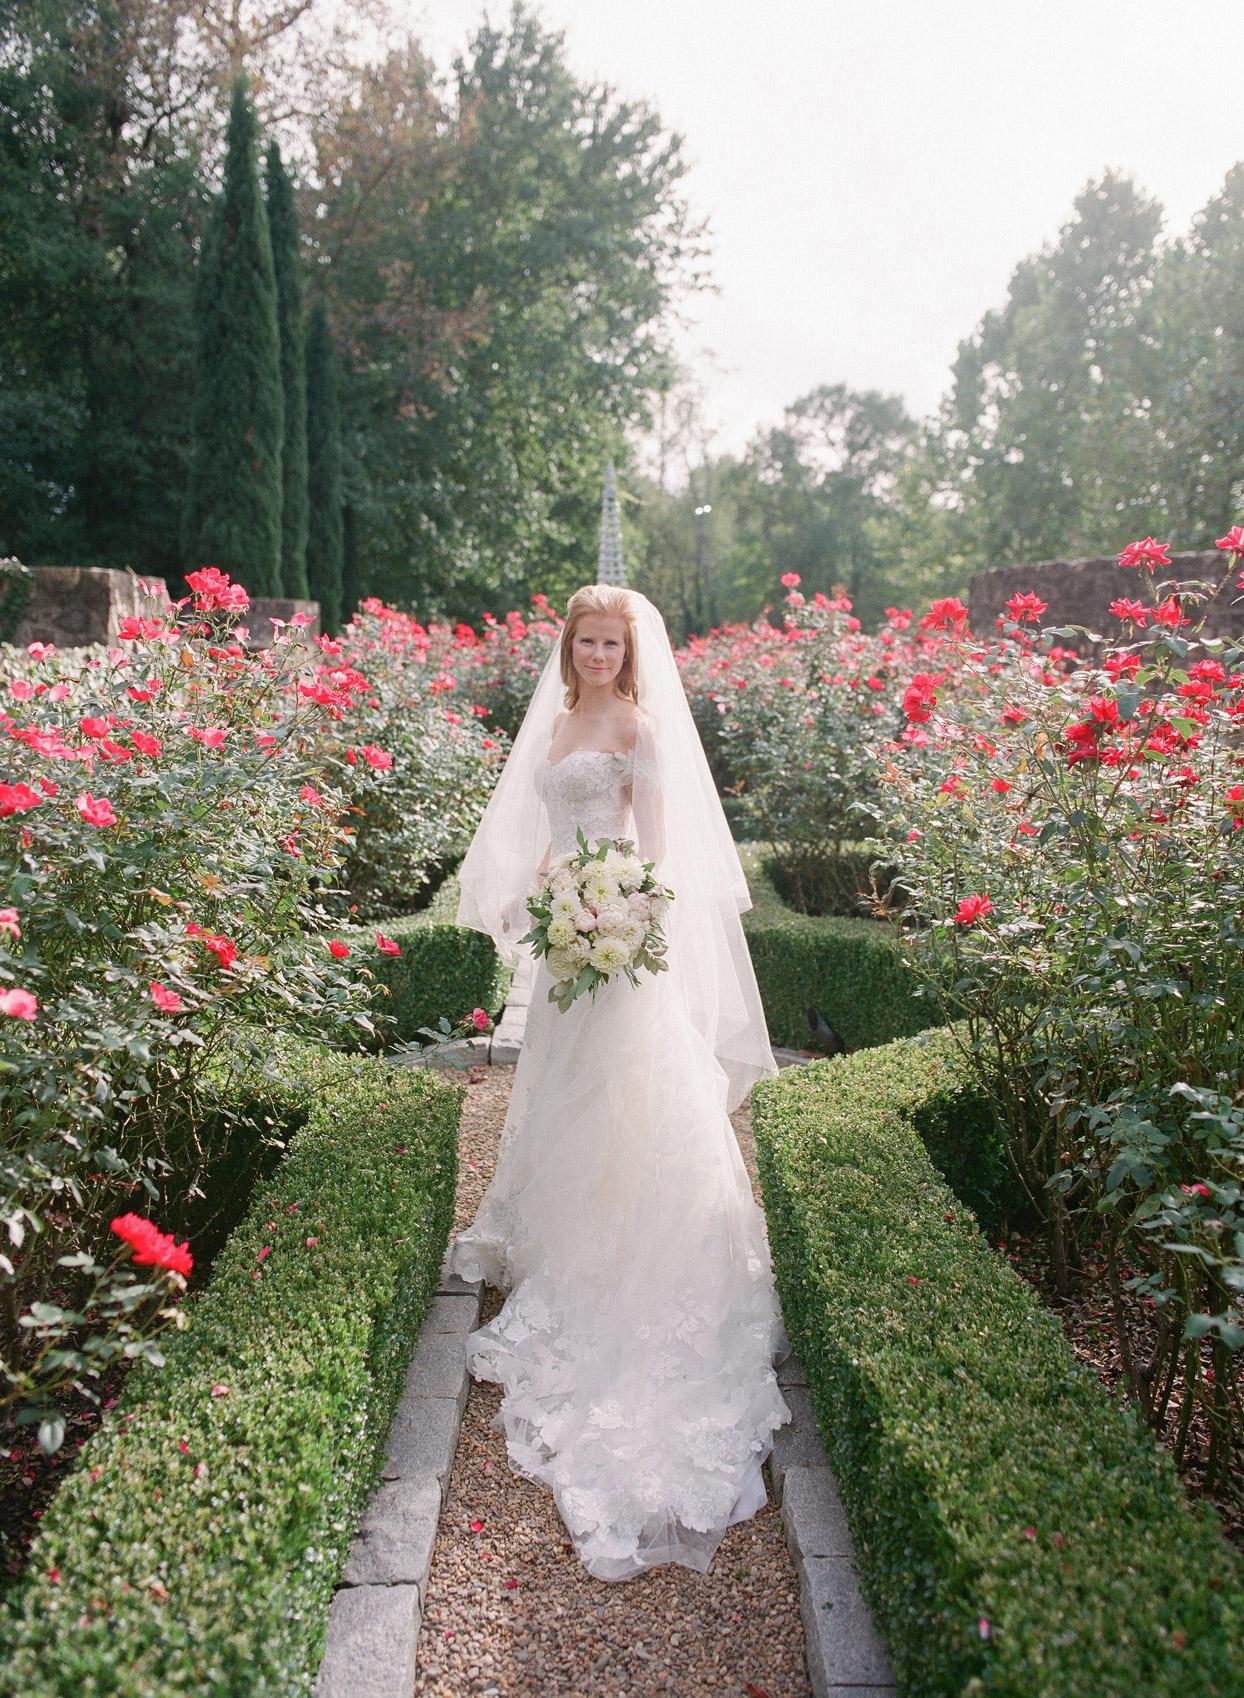 bride outside in flower garden wearing dress and veil